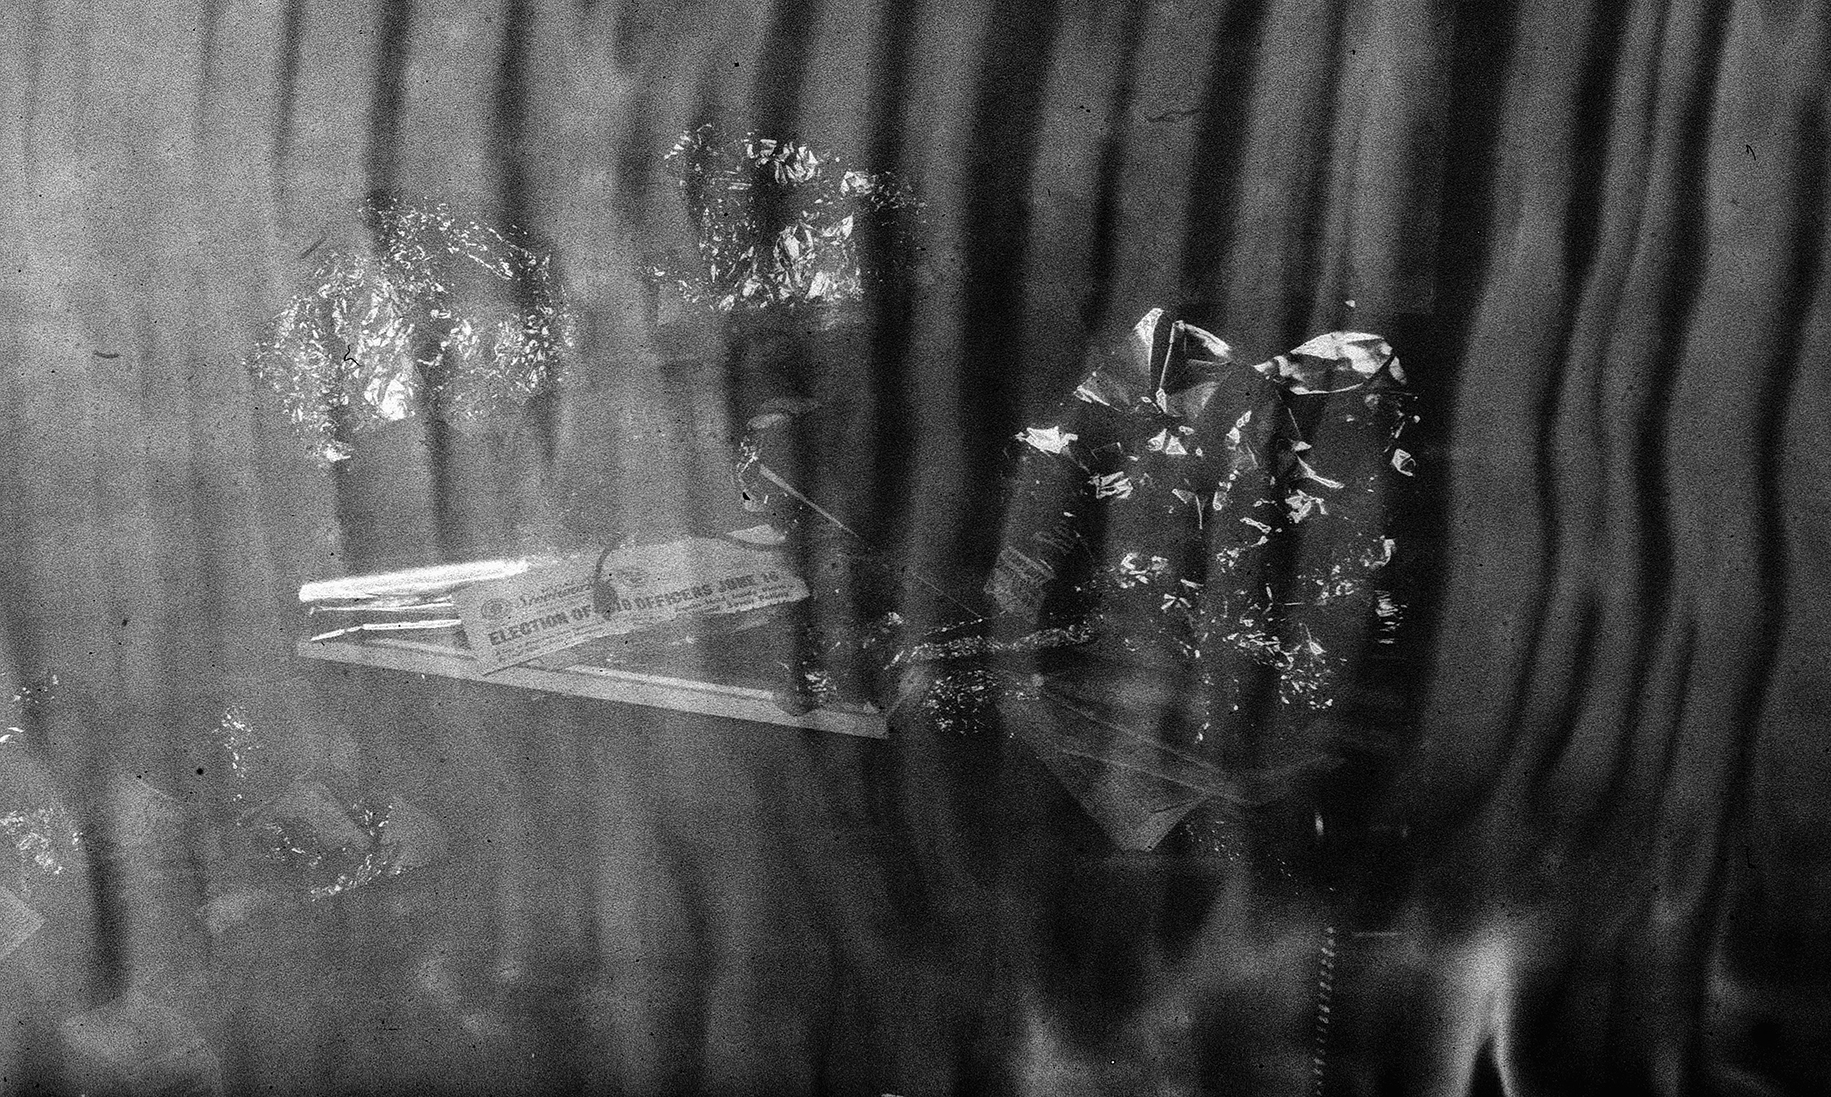 Paul Bundle 18 Roll 1 004.jpg